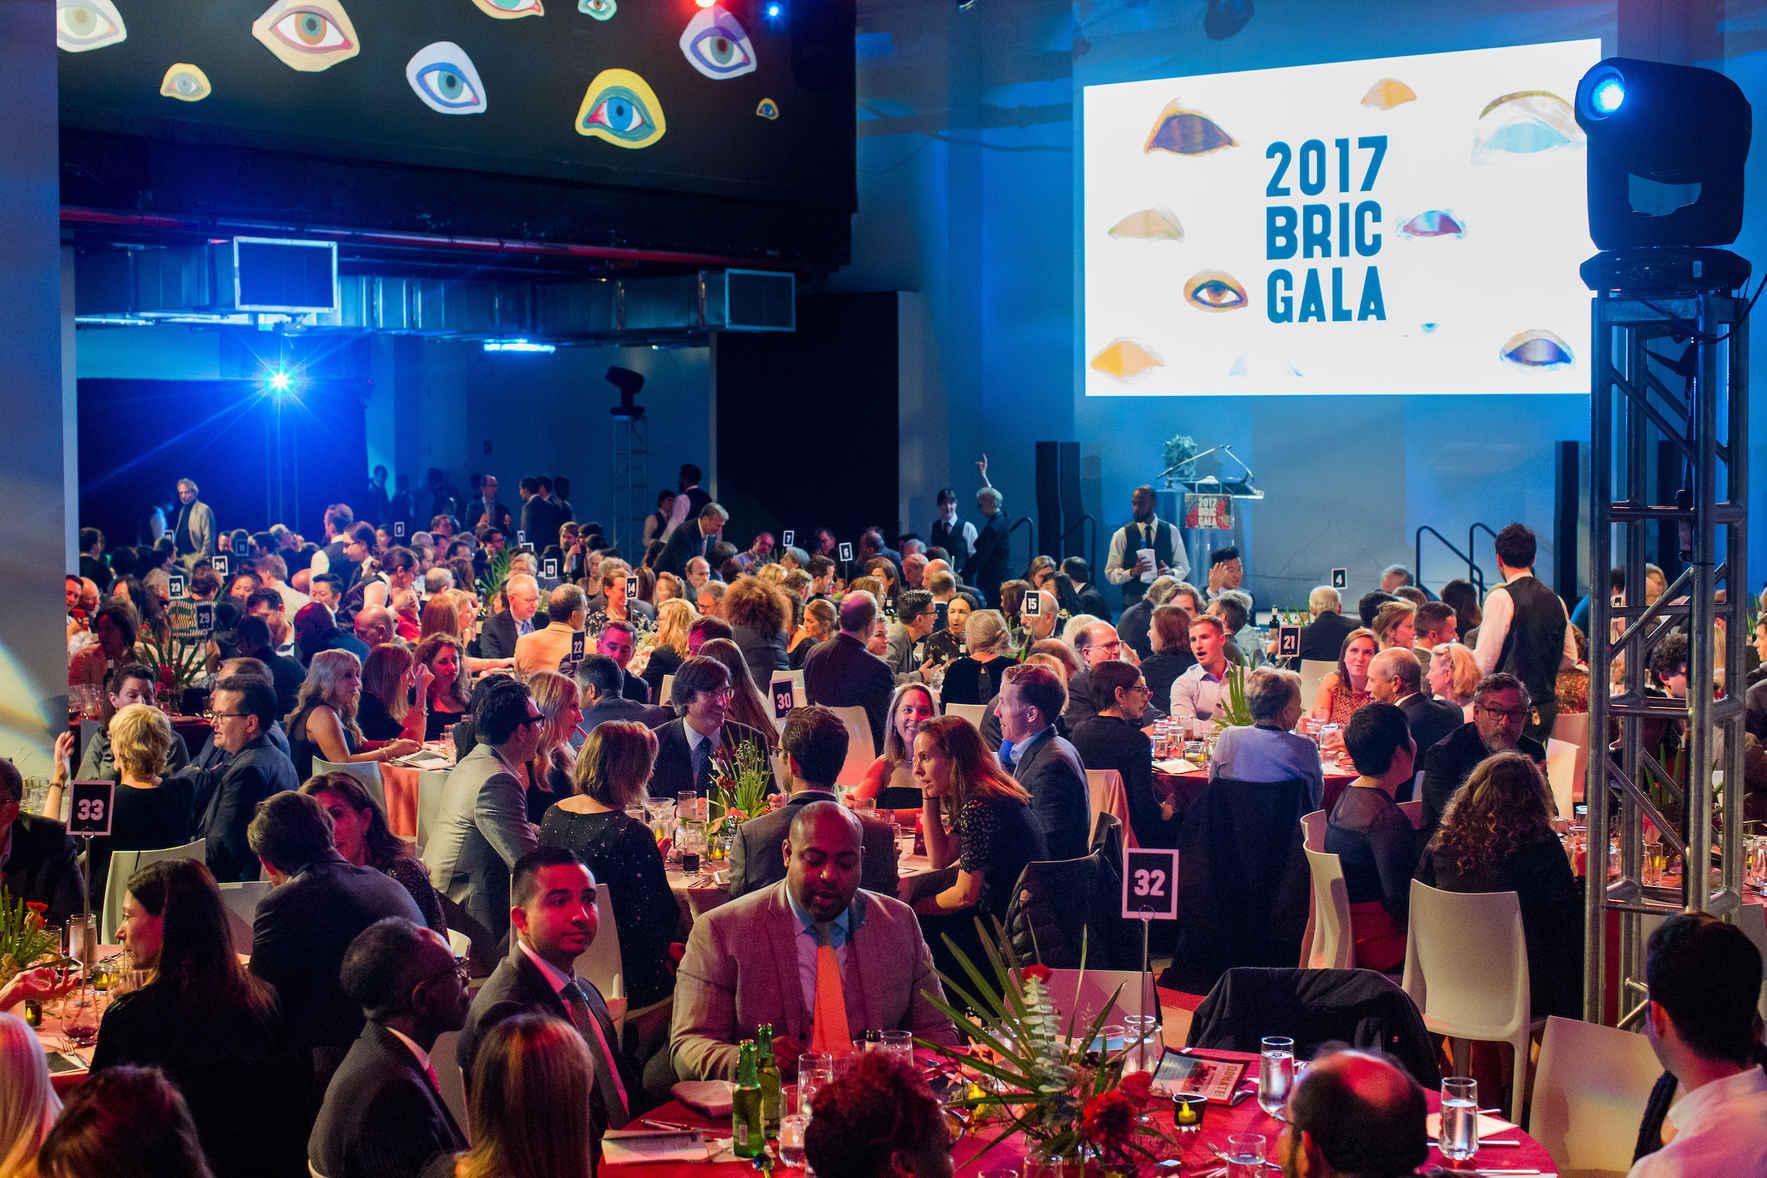 2018 BRIC Gala image